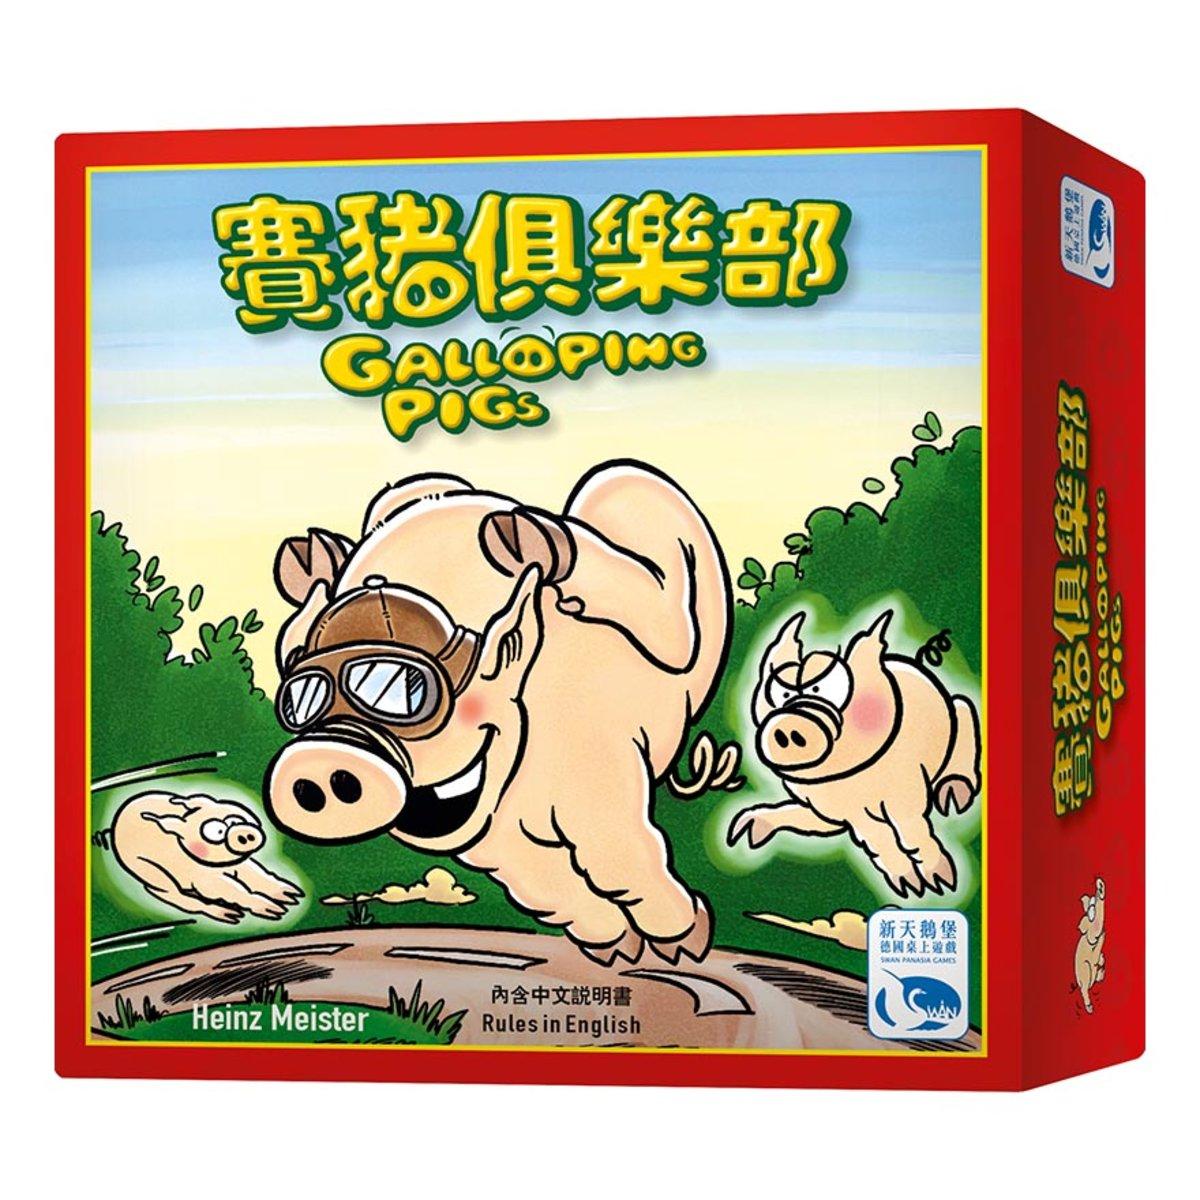 Galloping Pigs